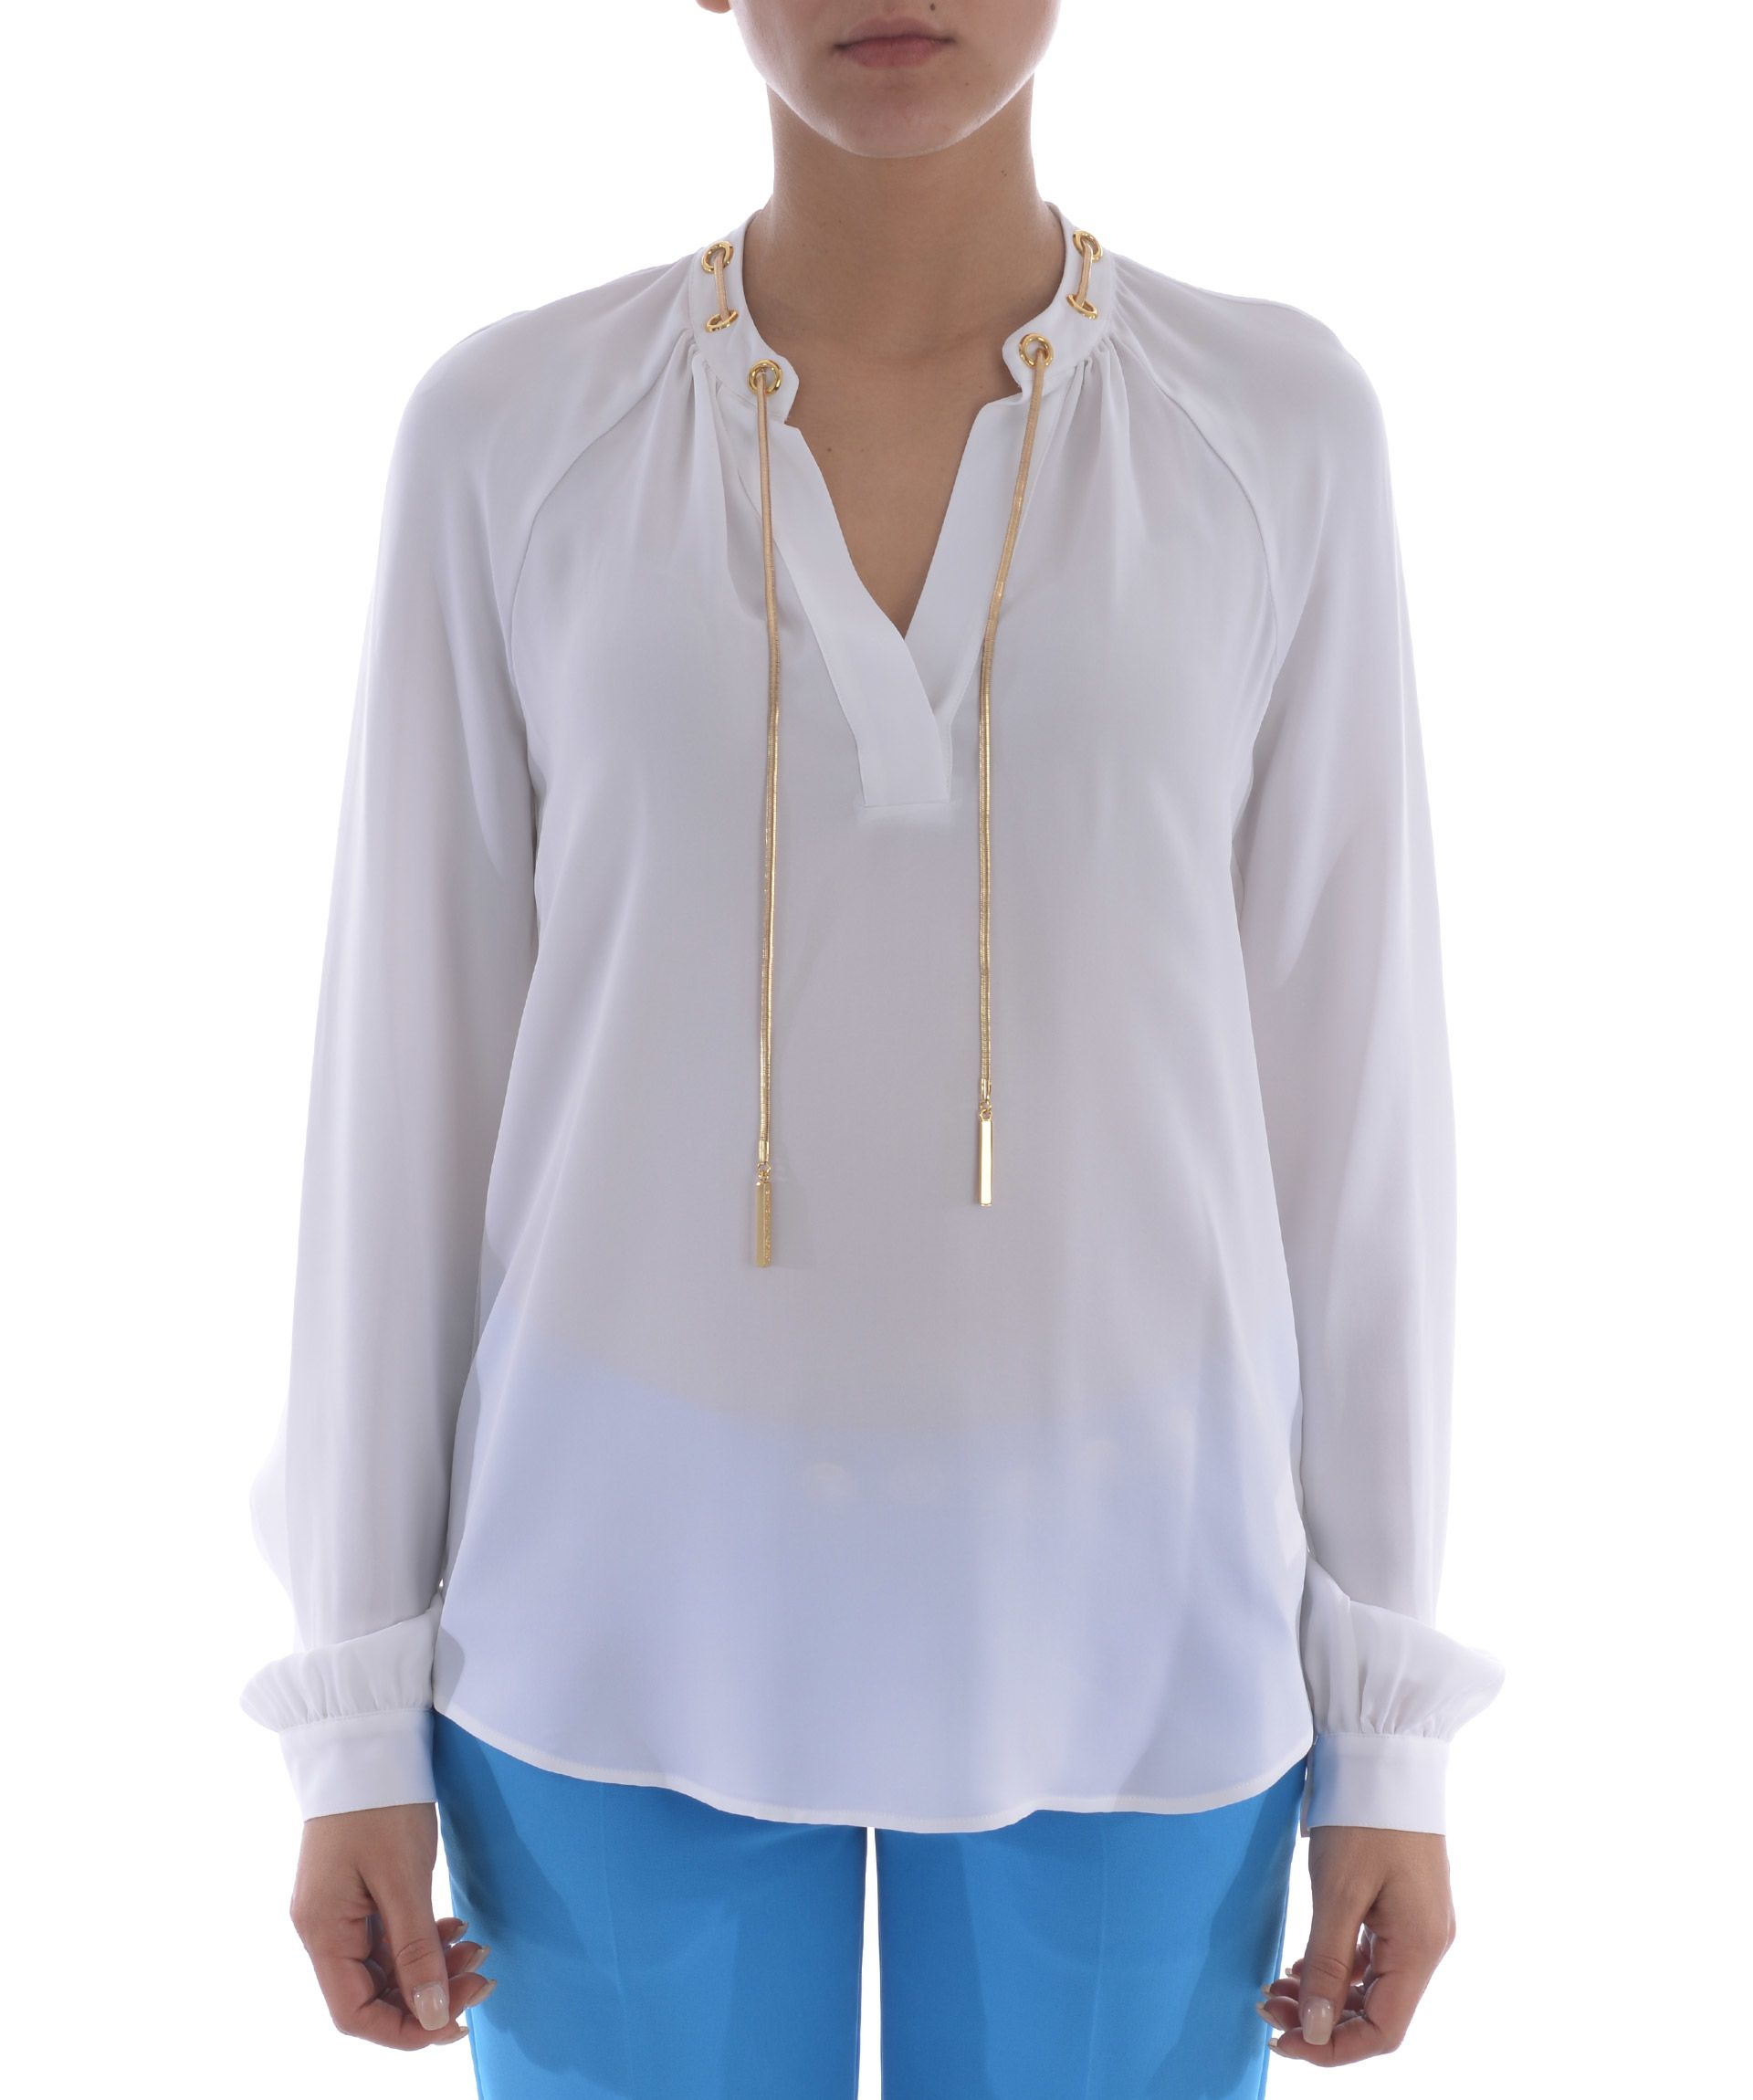 michael kors michael kors silk blouse bianco women 39 s bluse italist. Black Bedroom Furniture Sets. Home Design Ideas